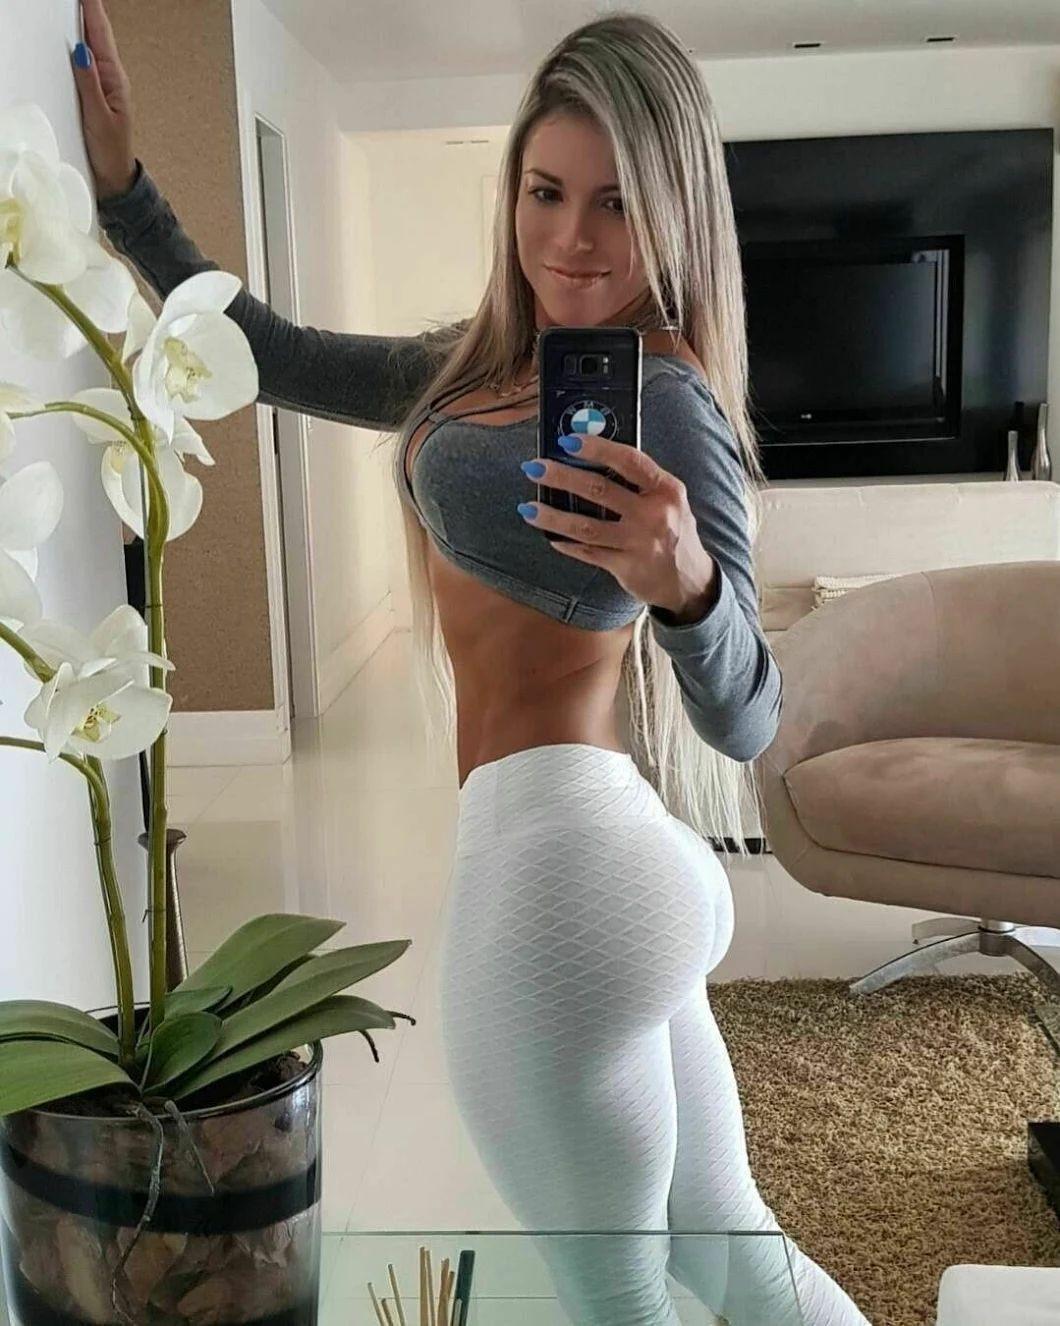 Pants porn tight Tight: 118,786